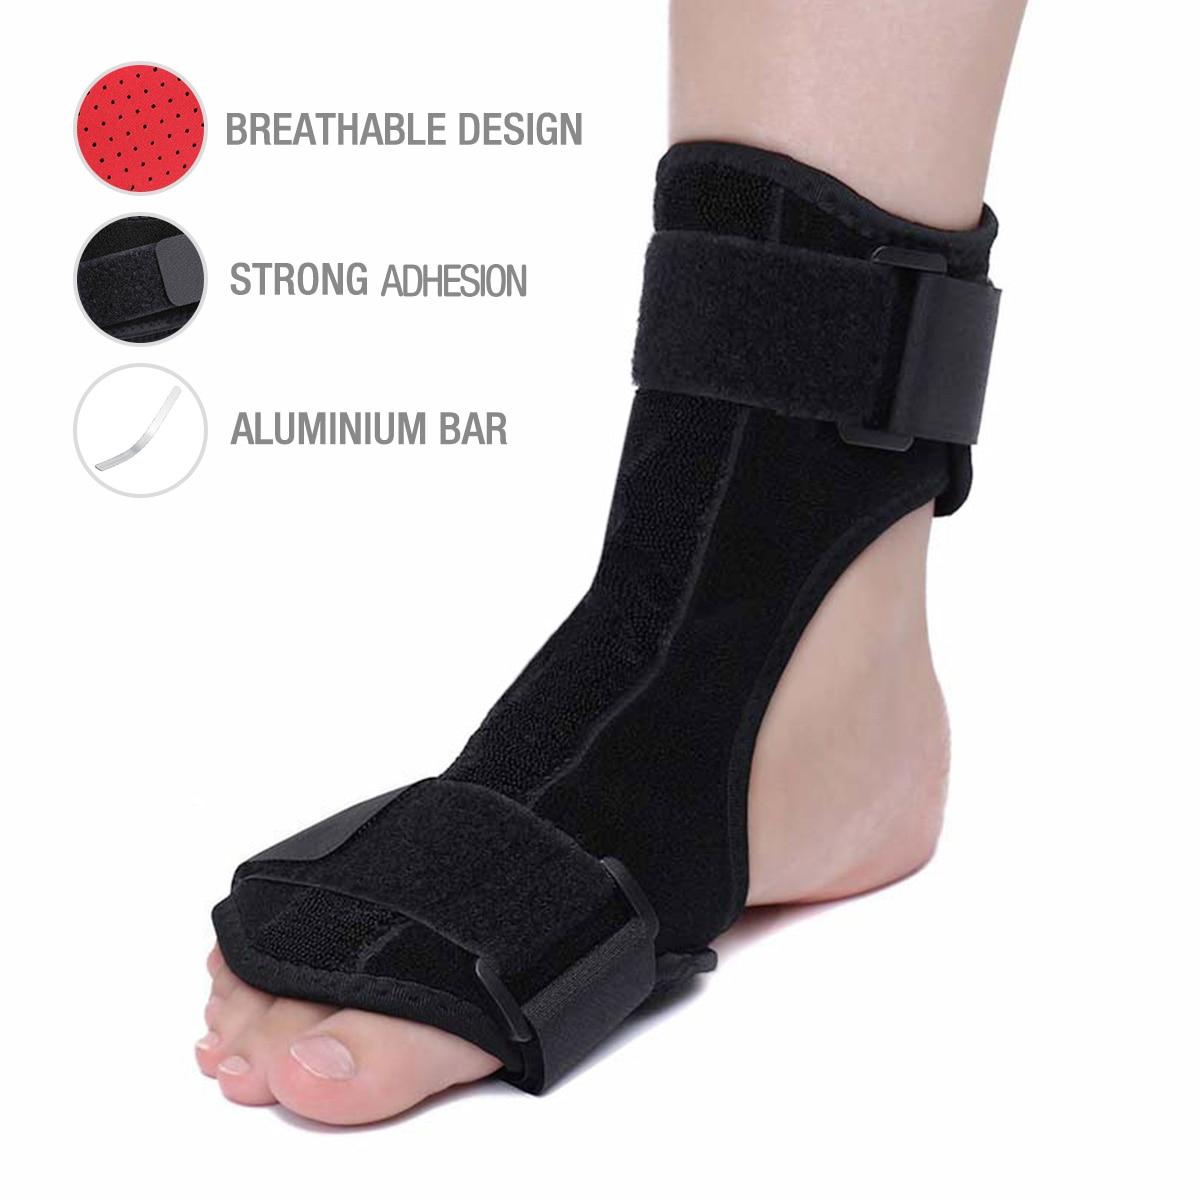 Plantar Fasciitis Night Splint Ankle Brace Support Foot Orthosis Adjustable Adult Drop Foot Heel Pain Pain Relief